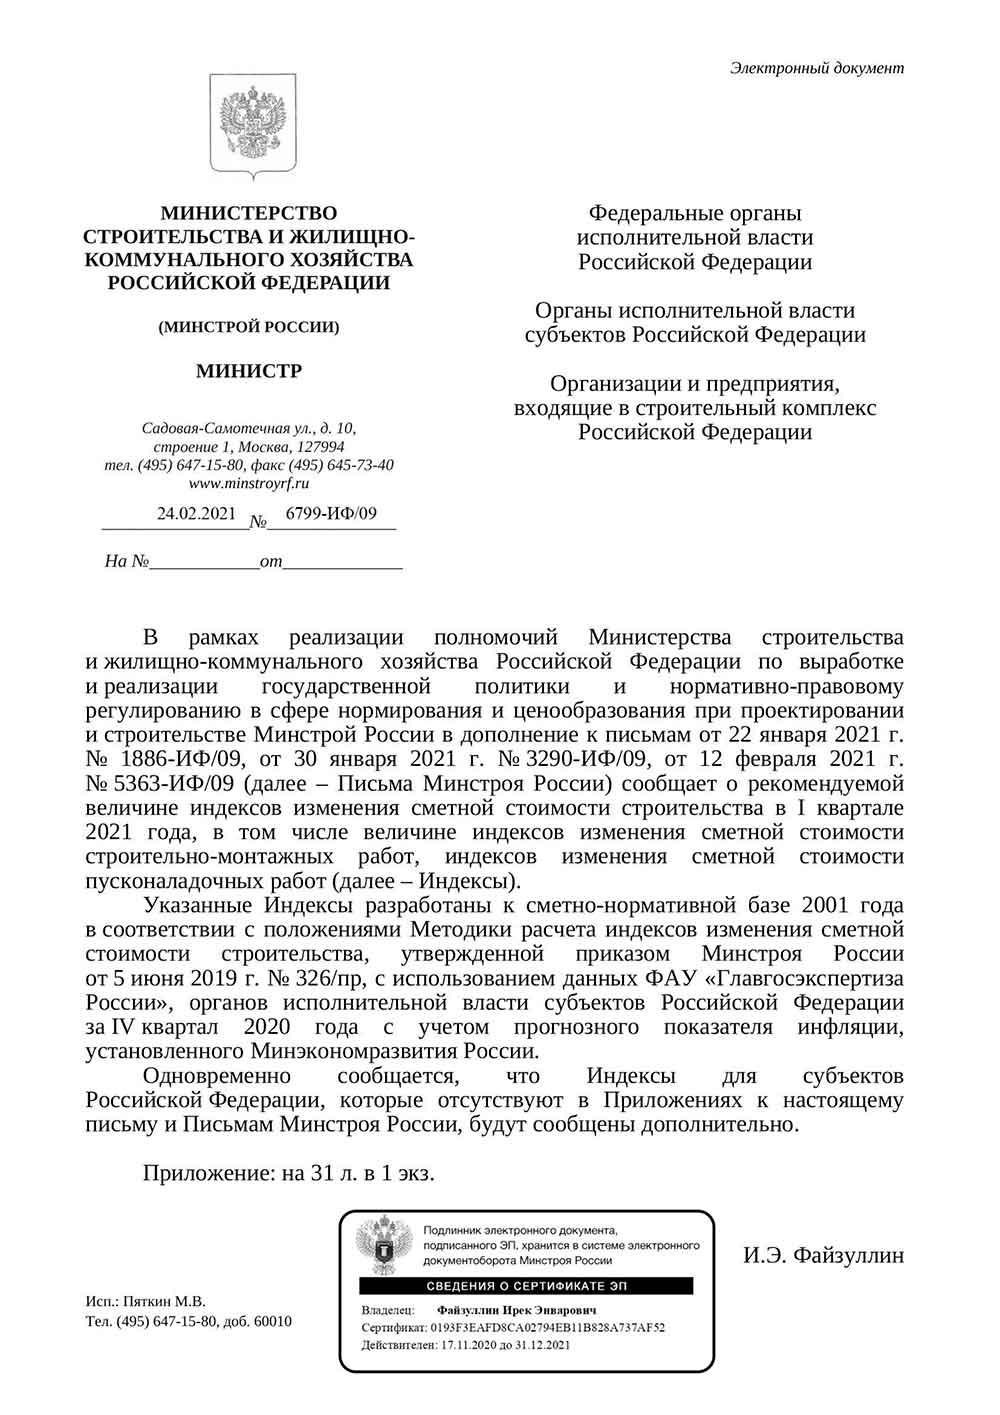 Письмо Минстроя РФ №6799-ИФ/09 от 24.02.2021 г.